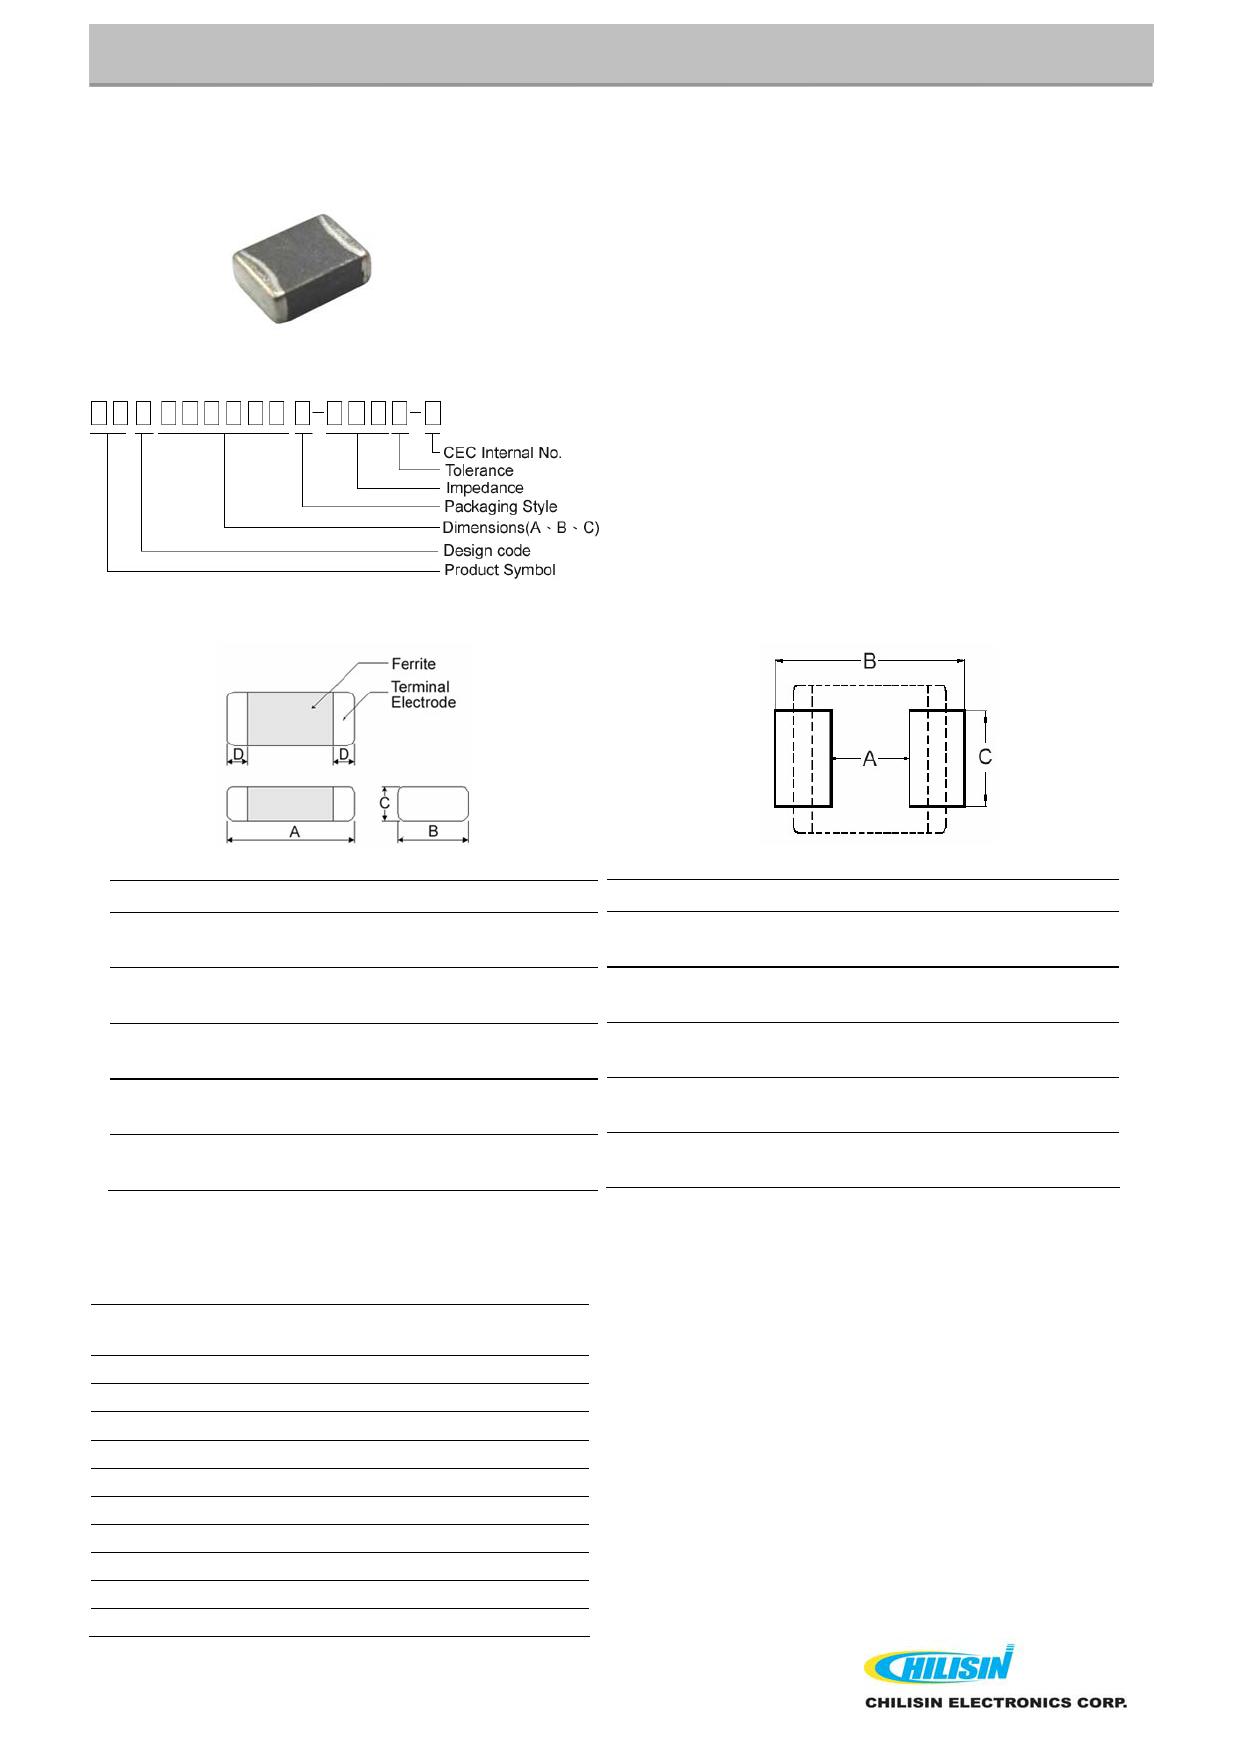 GBY321611T 데이터시트 및 GBY321611T PDF